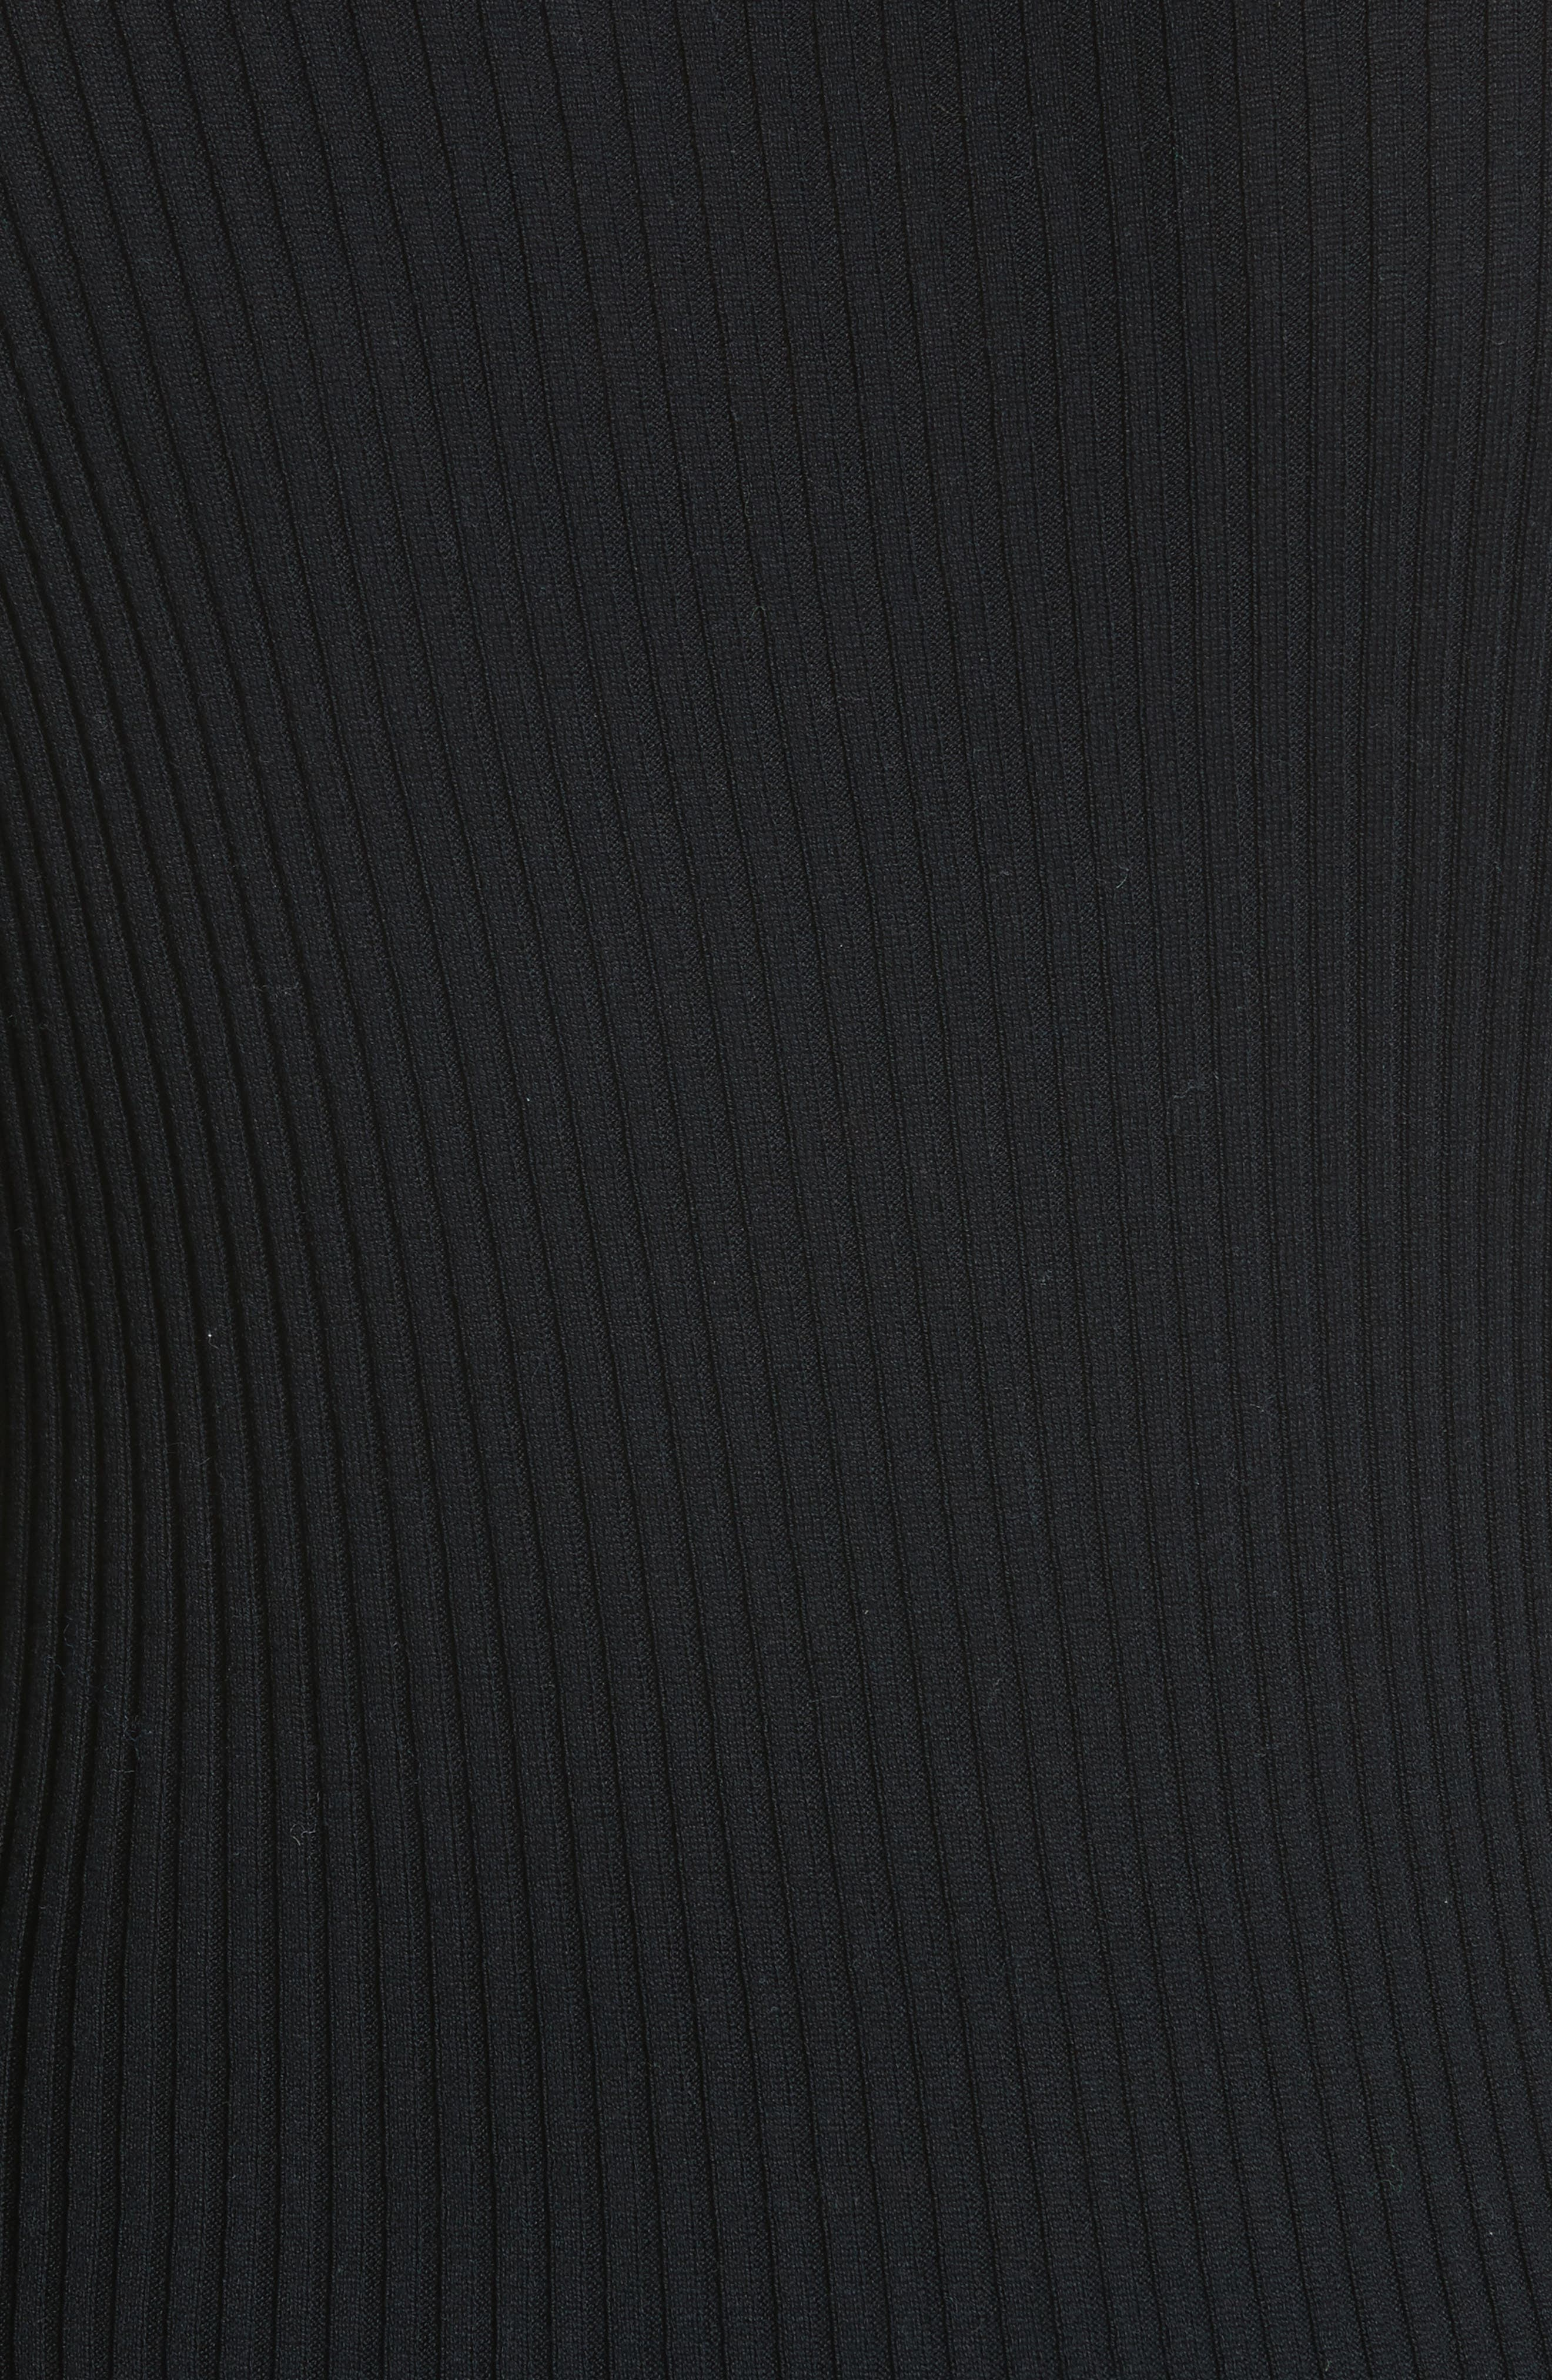 Le Cardigan Tordu Cardigan,                             Alternate thumbnail 5, color,